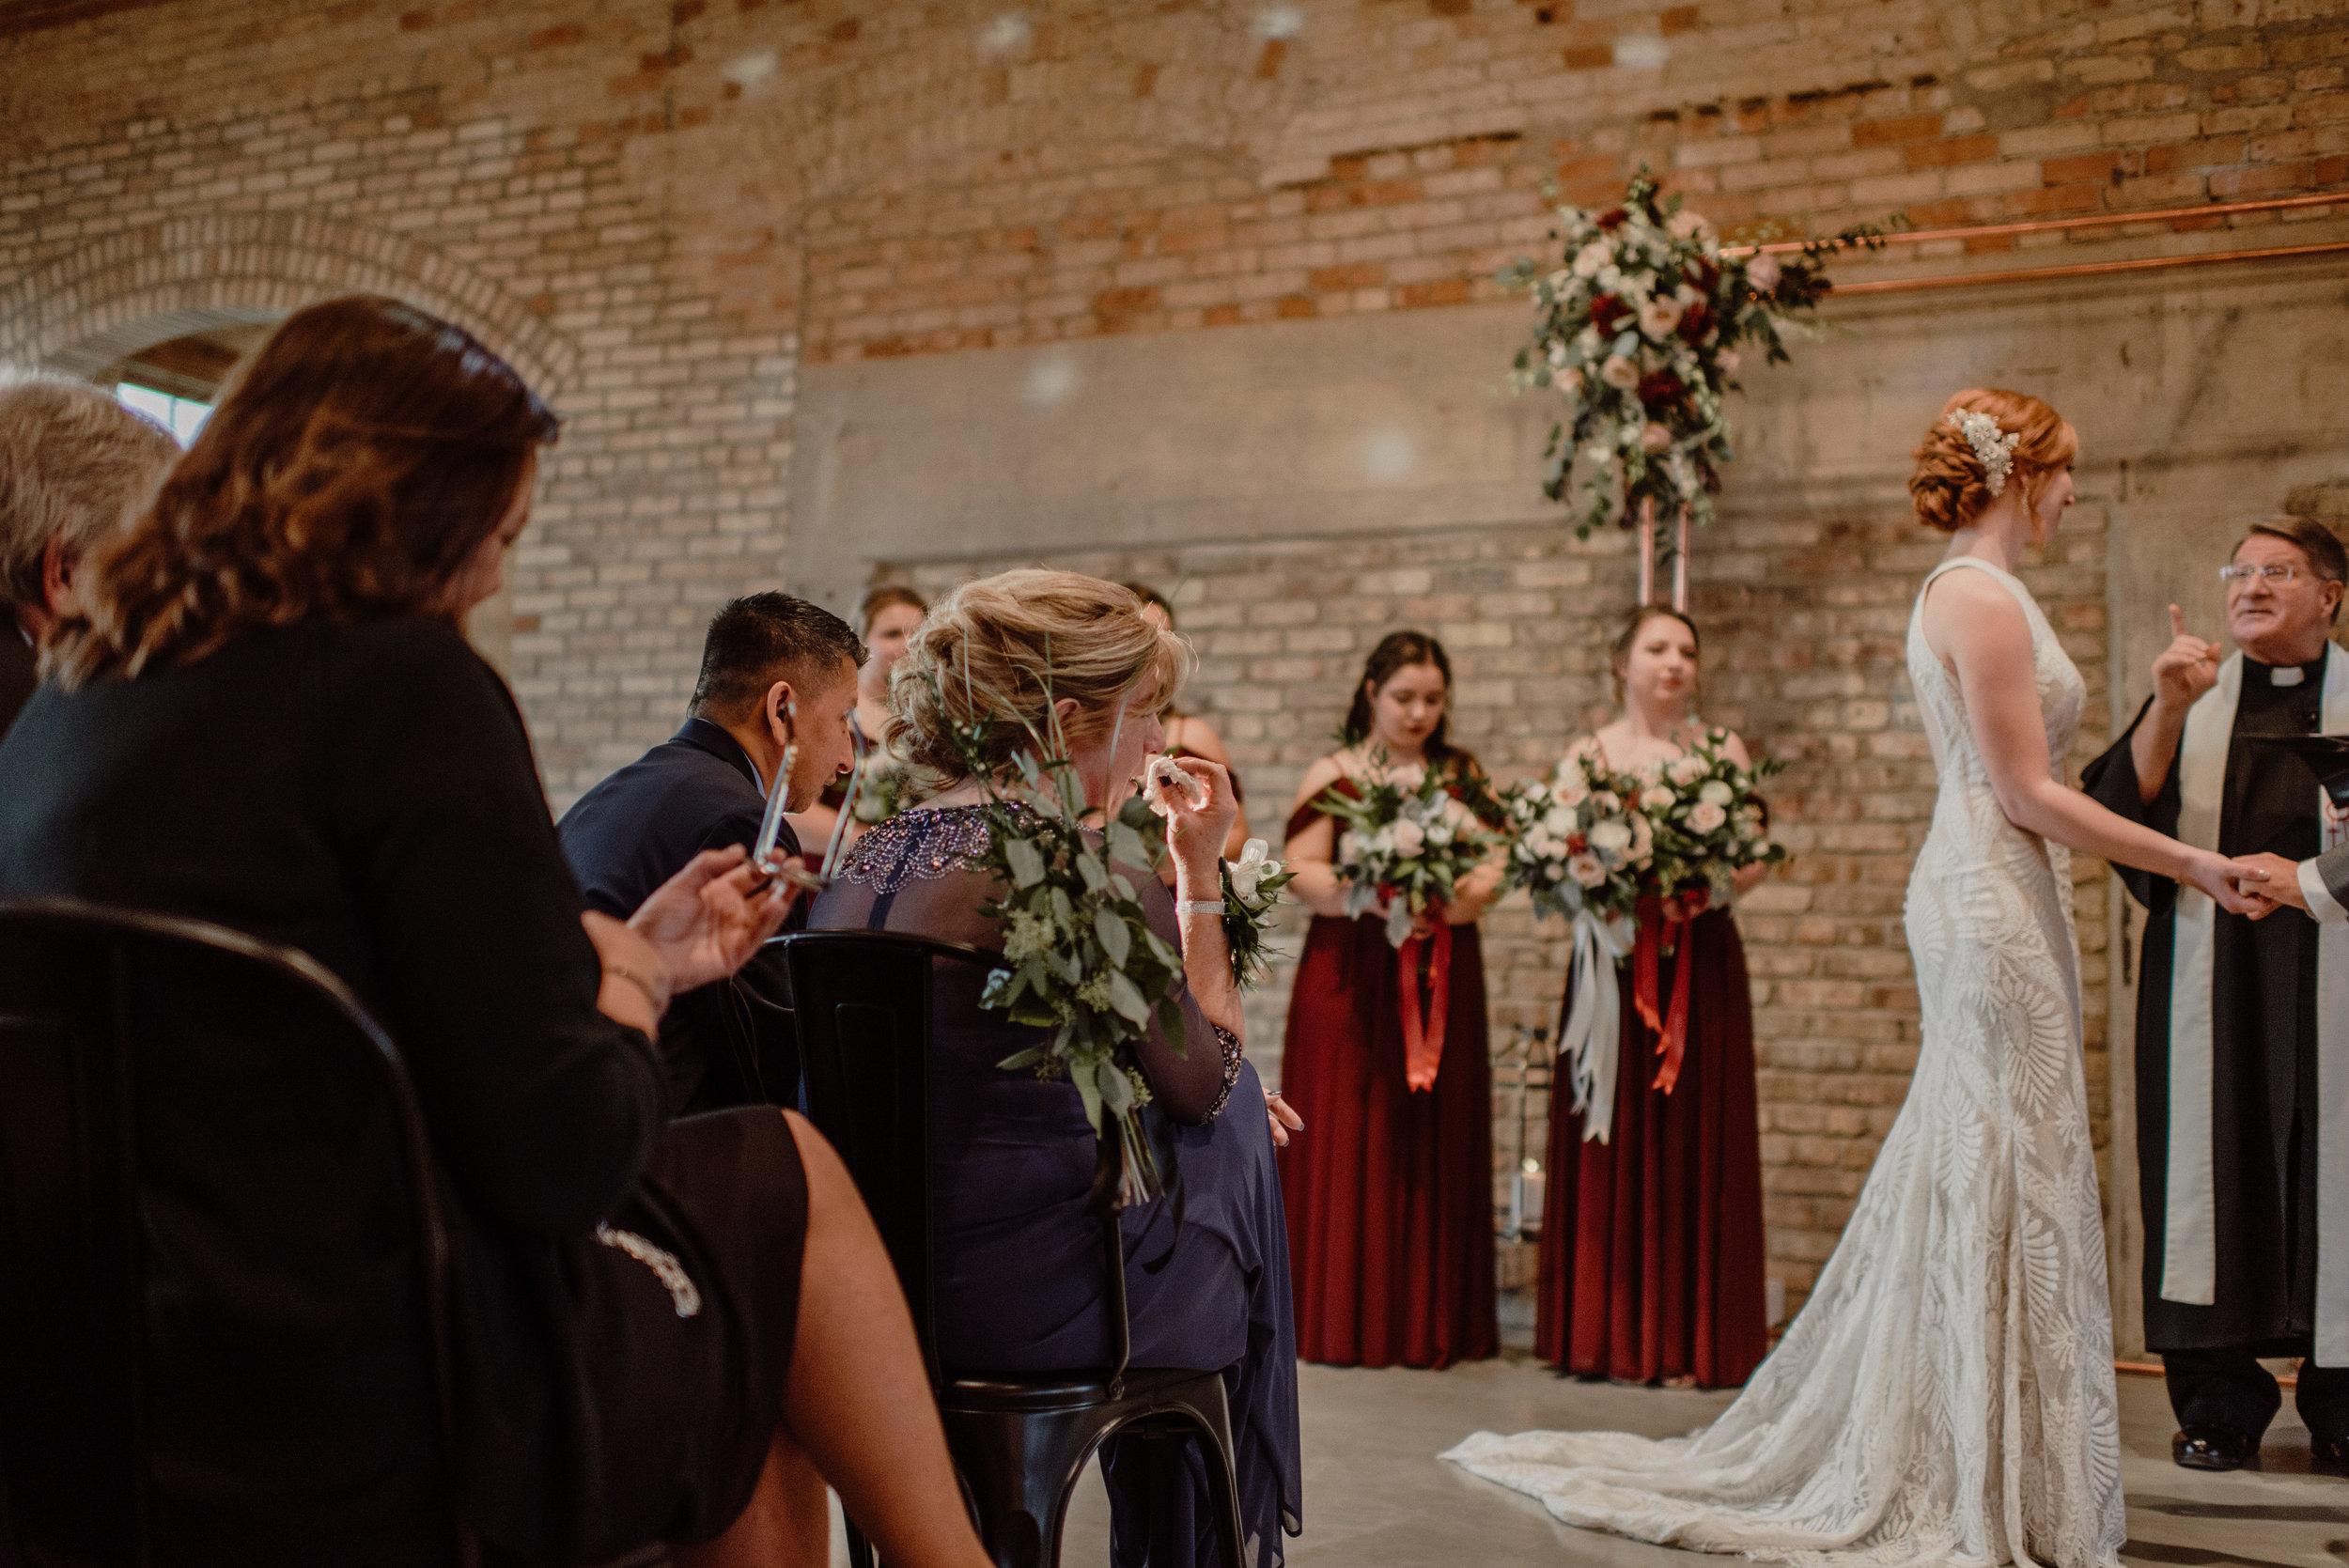 The Brix on Fox, Chicago Wedding Photographer, Zach and Rosalie00005.jpg